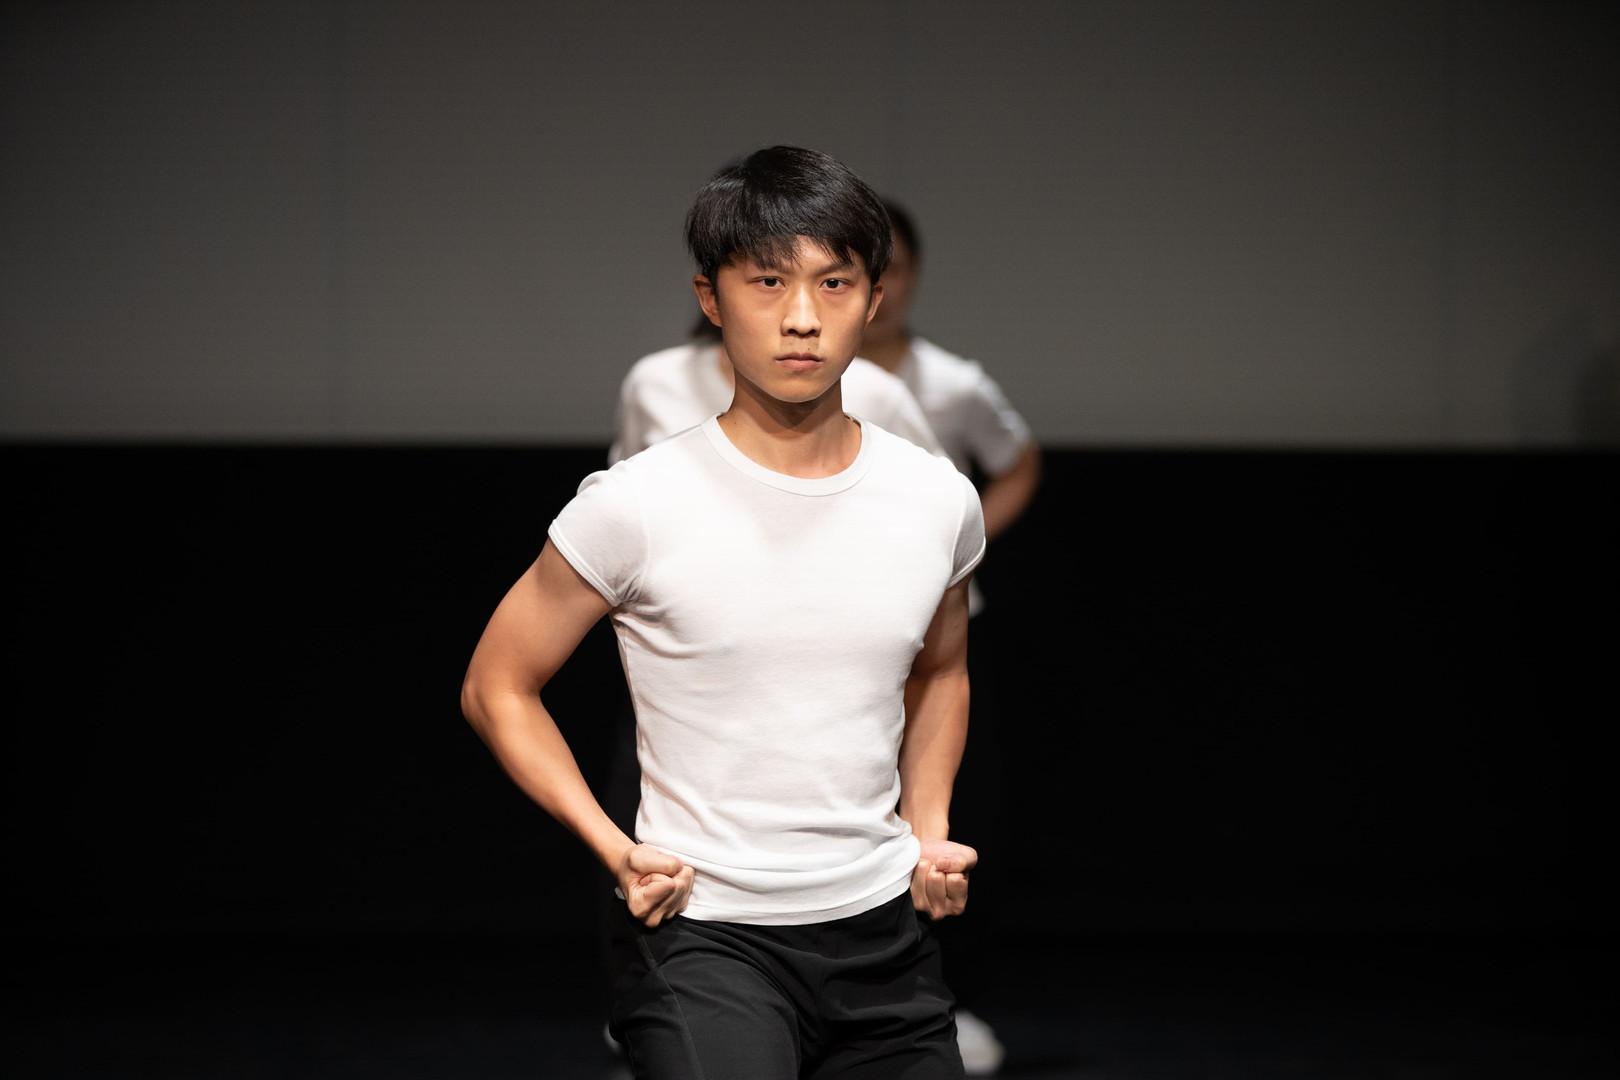 "何皓斐 Ho Ho-fei  高級舞蹈員 Senior Dancer  2009年畢業於香港演藝學院,獲頒藝術學士學位,主修中國舞,副修編舞。在校期間多次獲得獎學金,並獲第四屆深圳現代舞大賽表演銅獎及第三屆全國少數民族大匯演金獎。2010年加入香港舞蹈團,主要演出包括《清明上河圖》飾頑童、兒童舞劇《夢西遊》(重演)飾孫悟空、《塵埃落定》(2014年重演) 飾渣渣頭人兒子、《中華英雄》飾華劍雄、《彩雲南現》雙人舞〈手舞足蹈心狂跳〉、《十二生肖大冒險の冰雪奇熊》飾生肖猴子、《踏歌行》四人舞〈搶鼓〉、《金裝龍鳳茶樓》飾蝦餃、《劉三姐》飾管家、《小黃鴨》飾小鳥及《一水南天》飾石公等;屢次獲邀於香港芭蕾舞團演出《胡桃夾子》。編舞作品包括「八樓平台」《舞飛揚》〈放下〉、香港舞蹈聯盟「舞蹈平台2010」之《癮》、香港舞蹈聯會《一條大河》及《火龍》聯合編舞、香港舞蹈總會《緣起敦煌》(四度公演)助理編舞。其作品《守護》榮獲紫荊杯國際舞蹈邀請賽2013雙人舞組金獎。2019年5月晉升為香港舞蹈團高級舞蹈員,為「中國舞蹈與中國武術之交互研究與成果呈現」計劃之研究員之一。  Born in Hong Kong, Ho Ho-fei graduated from the Hong Kong Academy for Performing Arts majoring in Chinese dance with a minor in choreography in 2009. While at the Academy, Ho received several scholarships and received a bronze medal at the 4th Shenzhen Modern Dance Competition and a gold medal at the 3rd National Minority Performance Gala.  Ho joined the Hong Kong Dance Company in 2010. Recent performance highlights include major roles in Journey to the Wild West, Red Poppies (2014), Magical Adventures of Baby Polar Bear and the 12 Zodiac Animals, Chinese Hero: A Lone Exile, Dream of the Past: Ancient Chinese Court Dances, Dim Sum Adventures @ Lung Fung Teahouse 2.0, A Sea of Smiling LT Ducks and A Tale of the Southern Sky. Ho was invited by the Hong Kong Ballet to perform in The Nutcracker. He has choreographed for ""8/F Platform"" - Fly and for the Hong Kong Dance Alliance's ""2010 Dance Platform"". He was also co-choreographer of The Great River and Fire Dragon for the Association of Hong Kong Dance Organizations. His work Protect received the gold medal in the pas de deux category at the 2013 Hong Kong Bauhinia Cup International Dance Invitation Competition. Ho was promoted to Senior Dancer at HKDC in May 2019. He is also a researcher of HKDC's Research study on Chinese martial arts and Chinese dance."